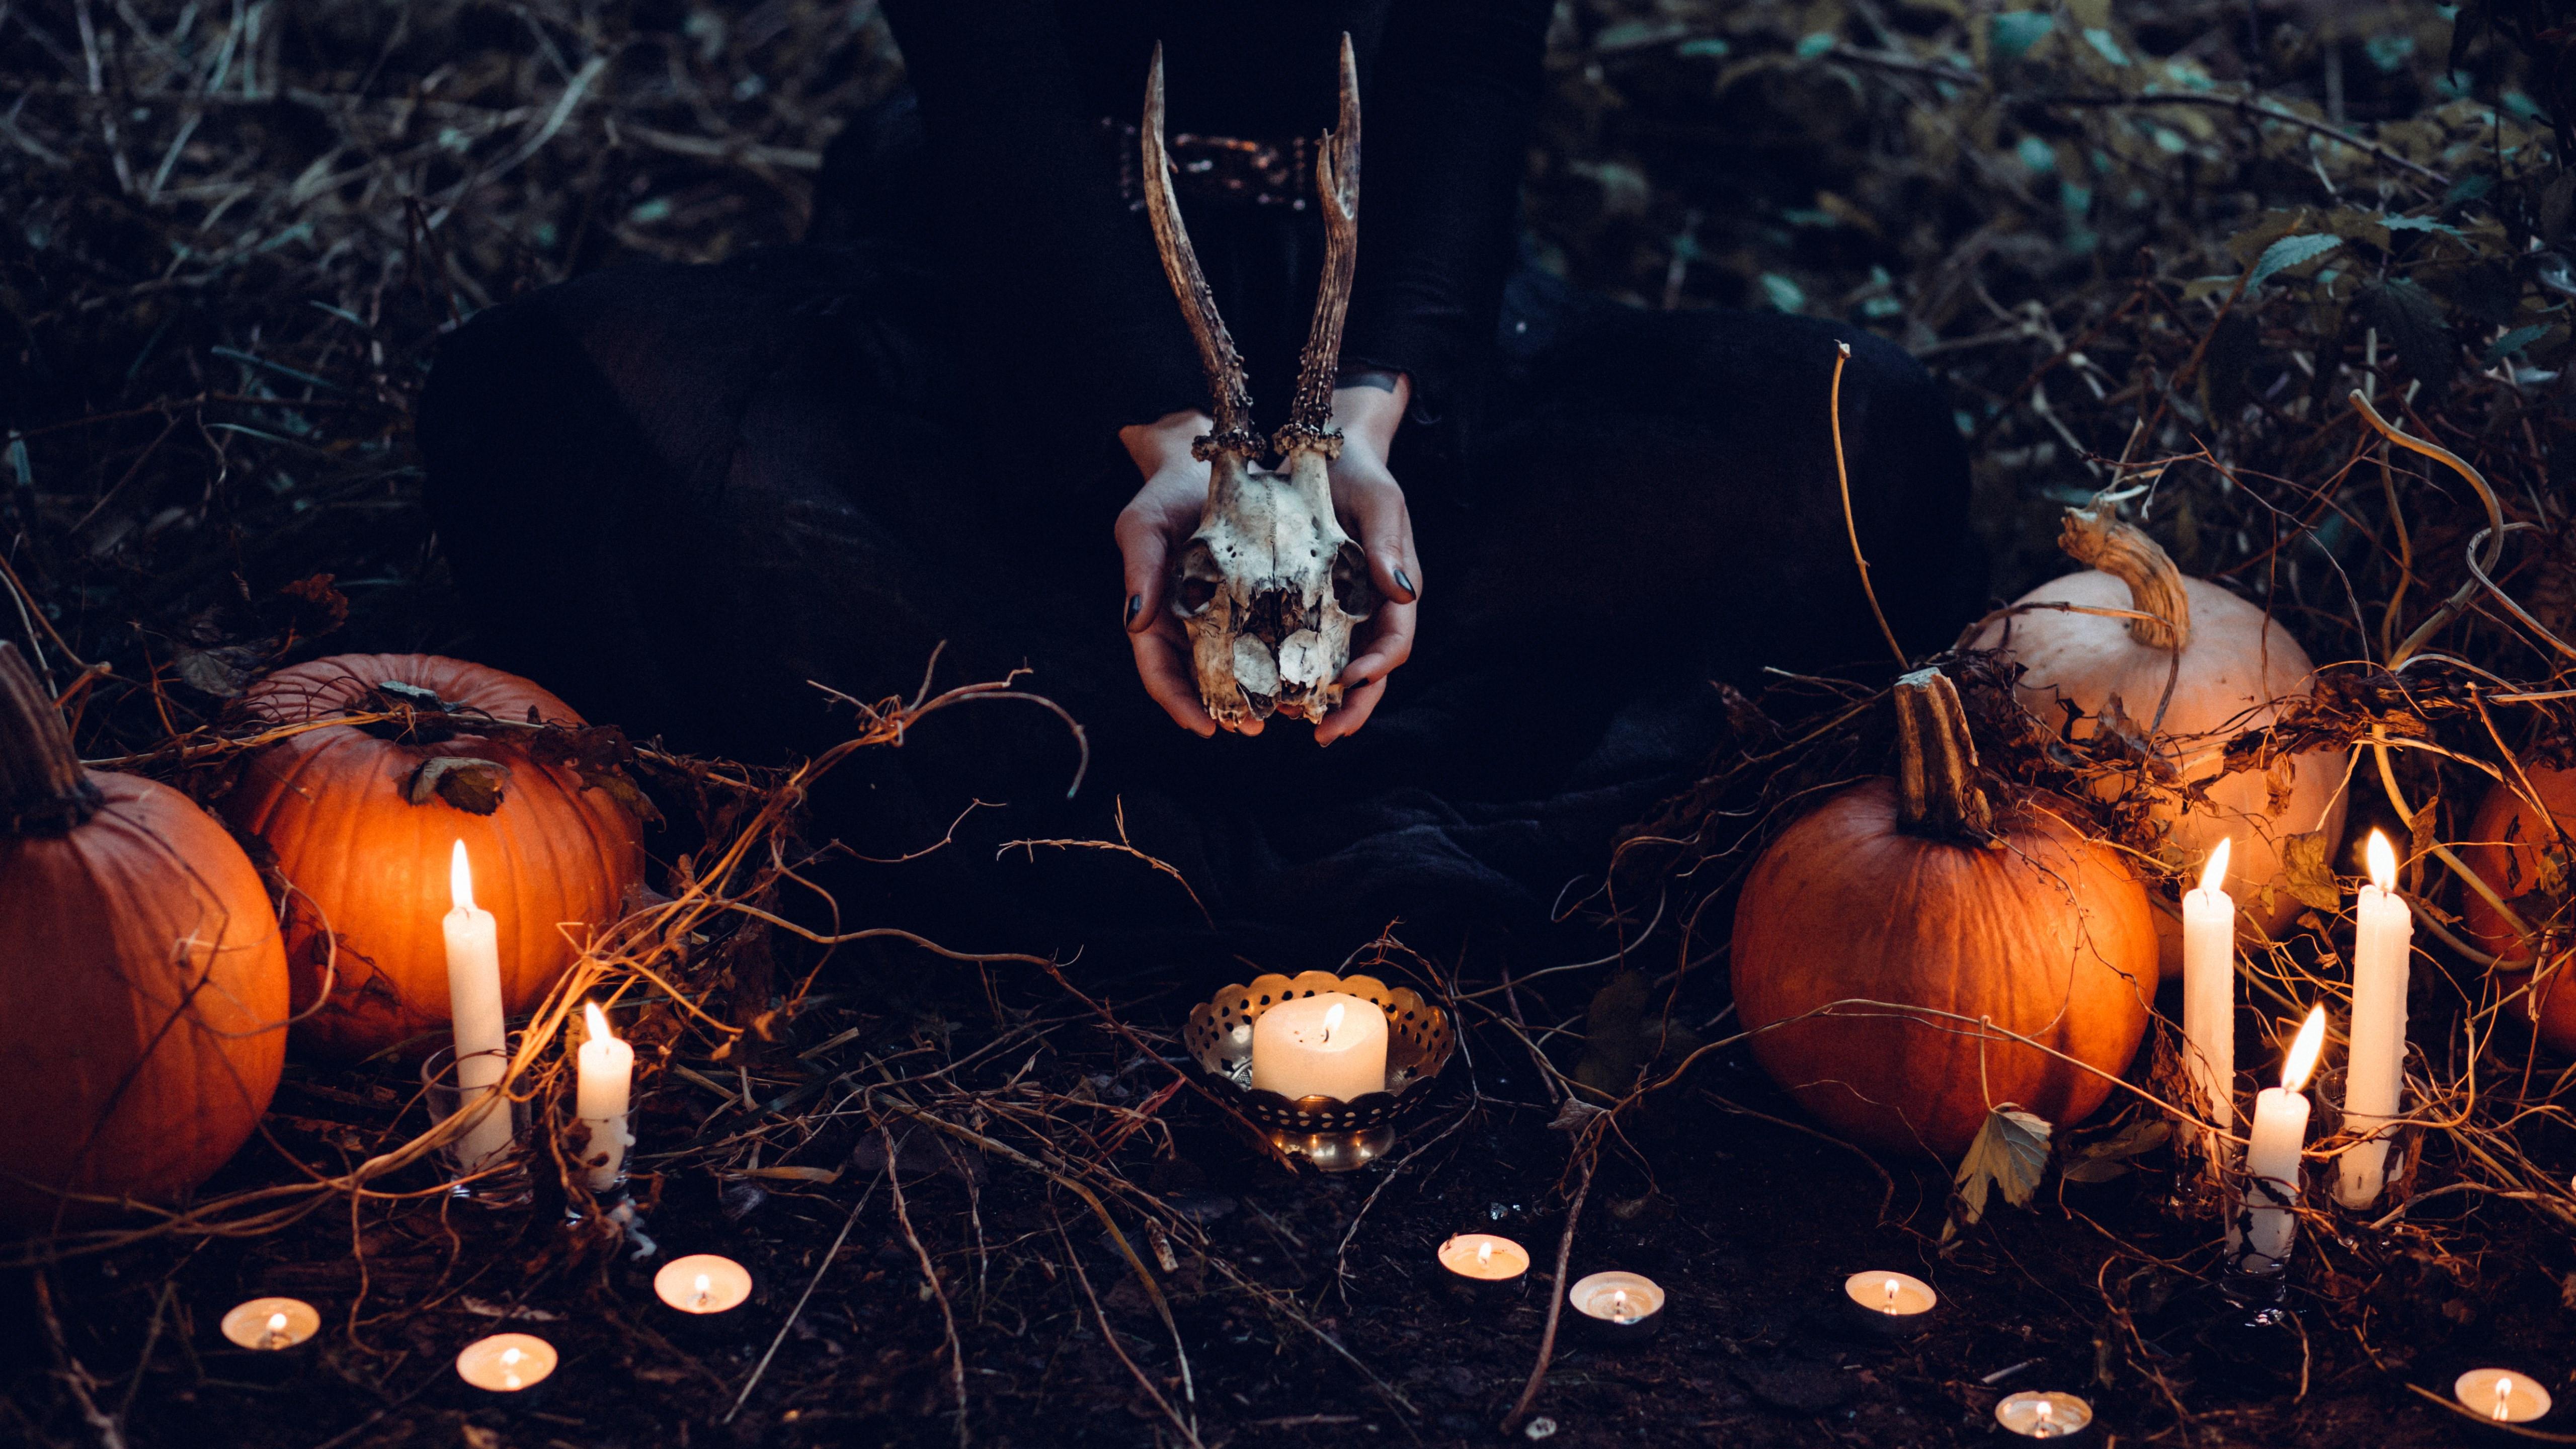 Download wallpaper Halloween ritual 5120x2880 5120x2880